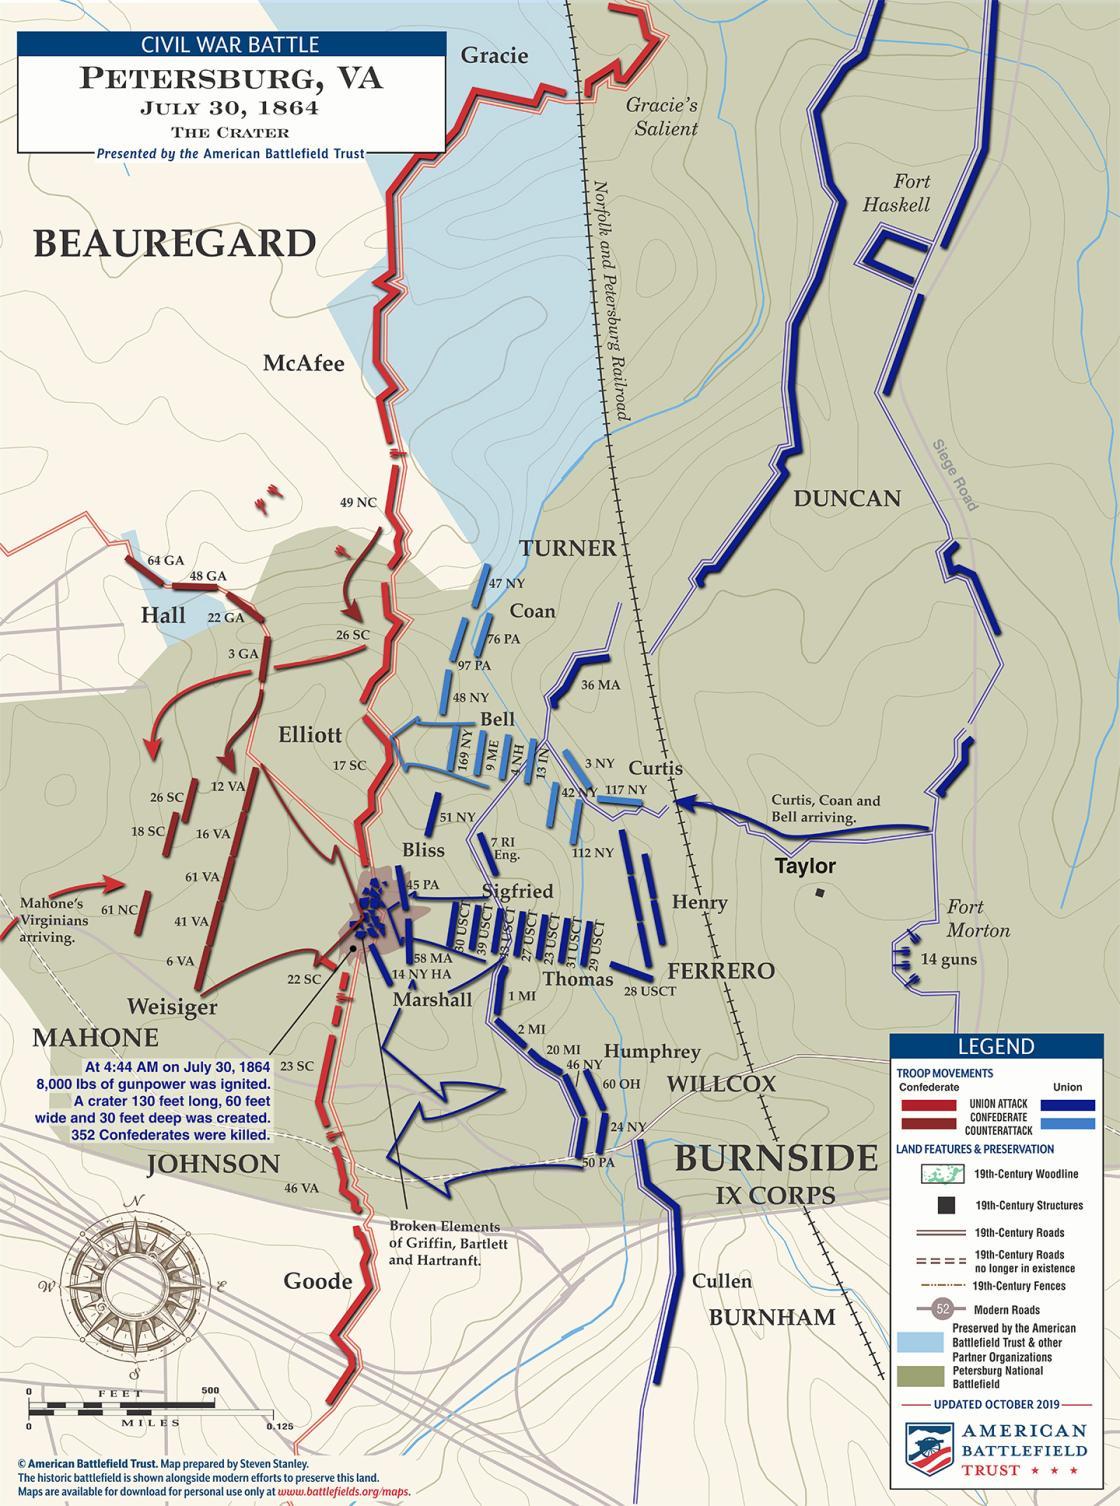 Petersburg - Battle of the Crater - July 30, 1864 (November 2019)